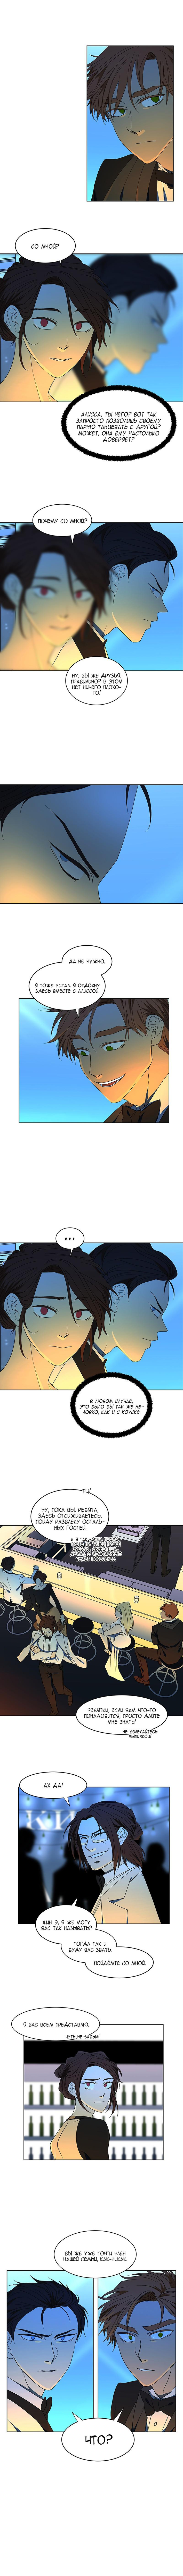 https://r1.ninemanga.com/comics/pic2/27/32027/415457/1530933085874.jpg Page 4